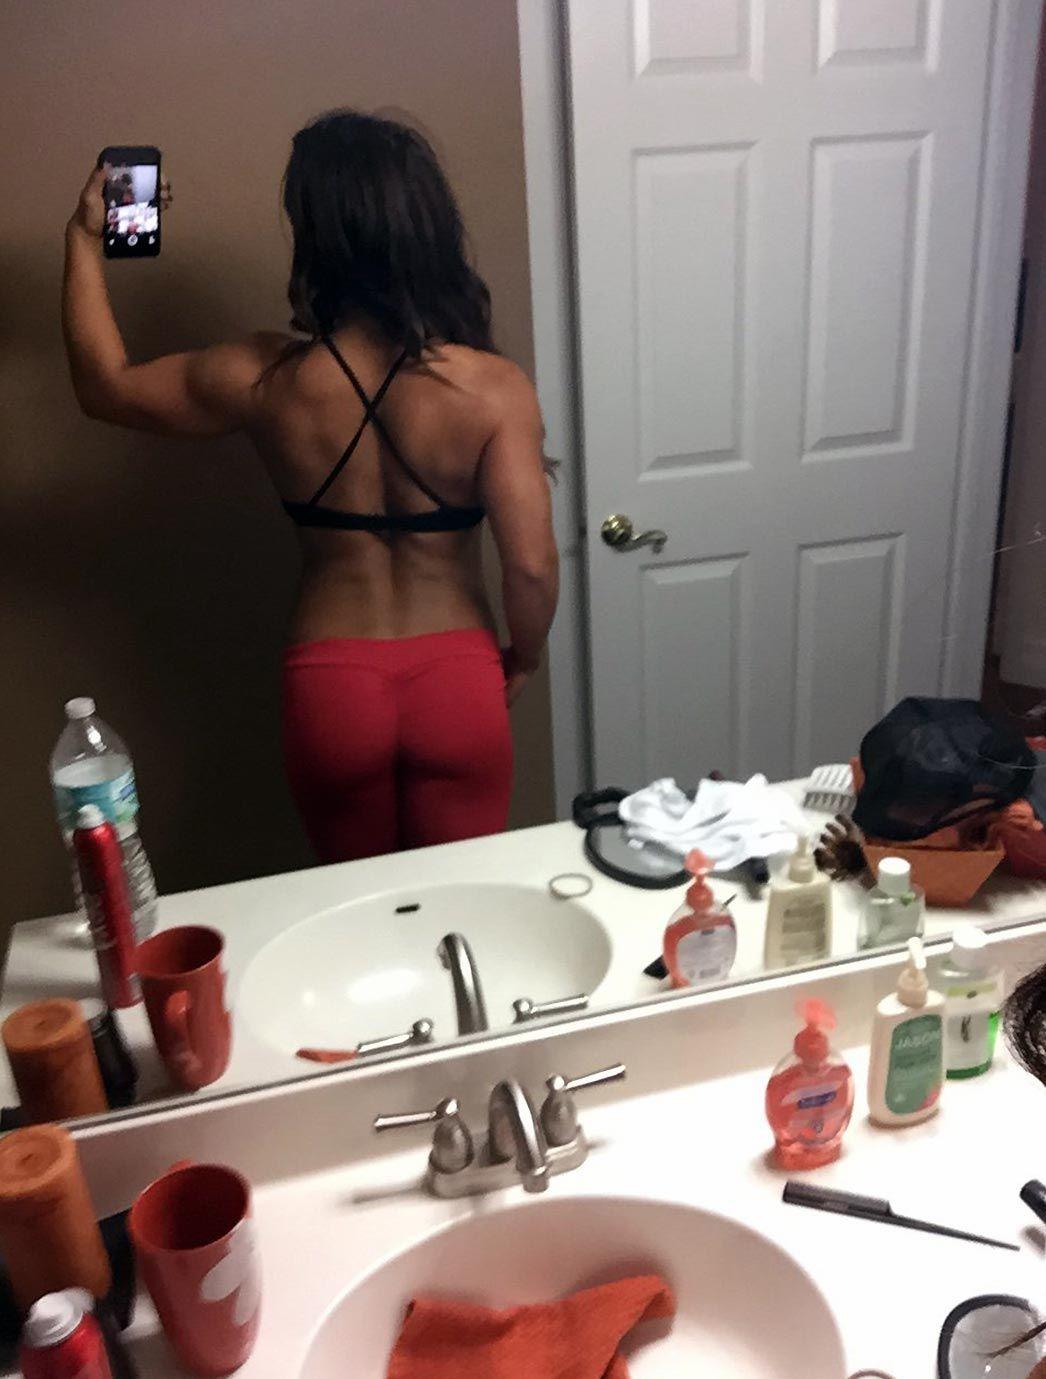 Celeste Bonin Nude Leaked The Fappening & Sexy 0121